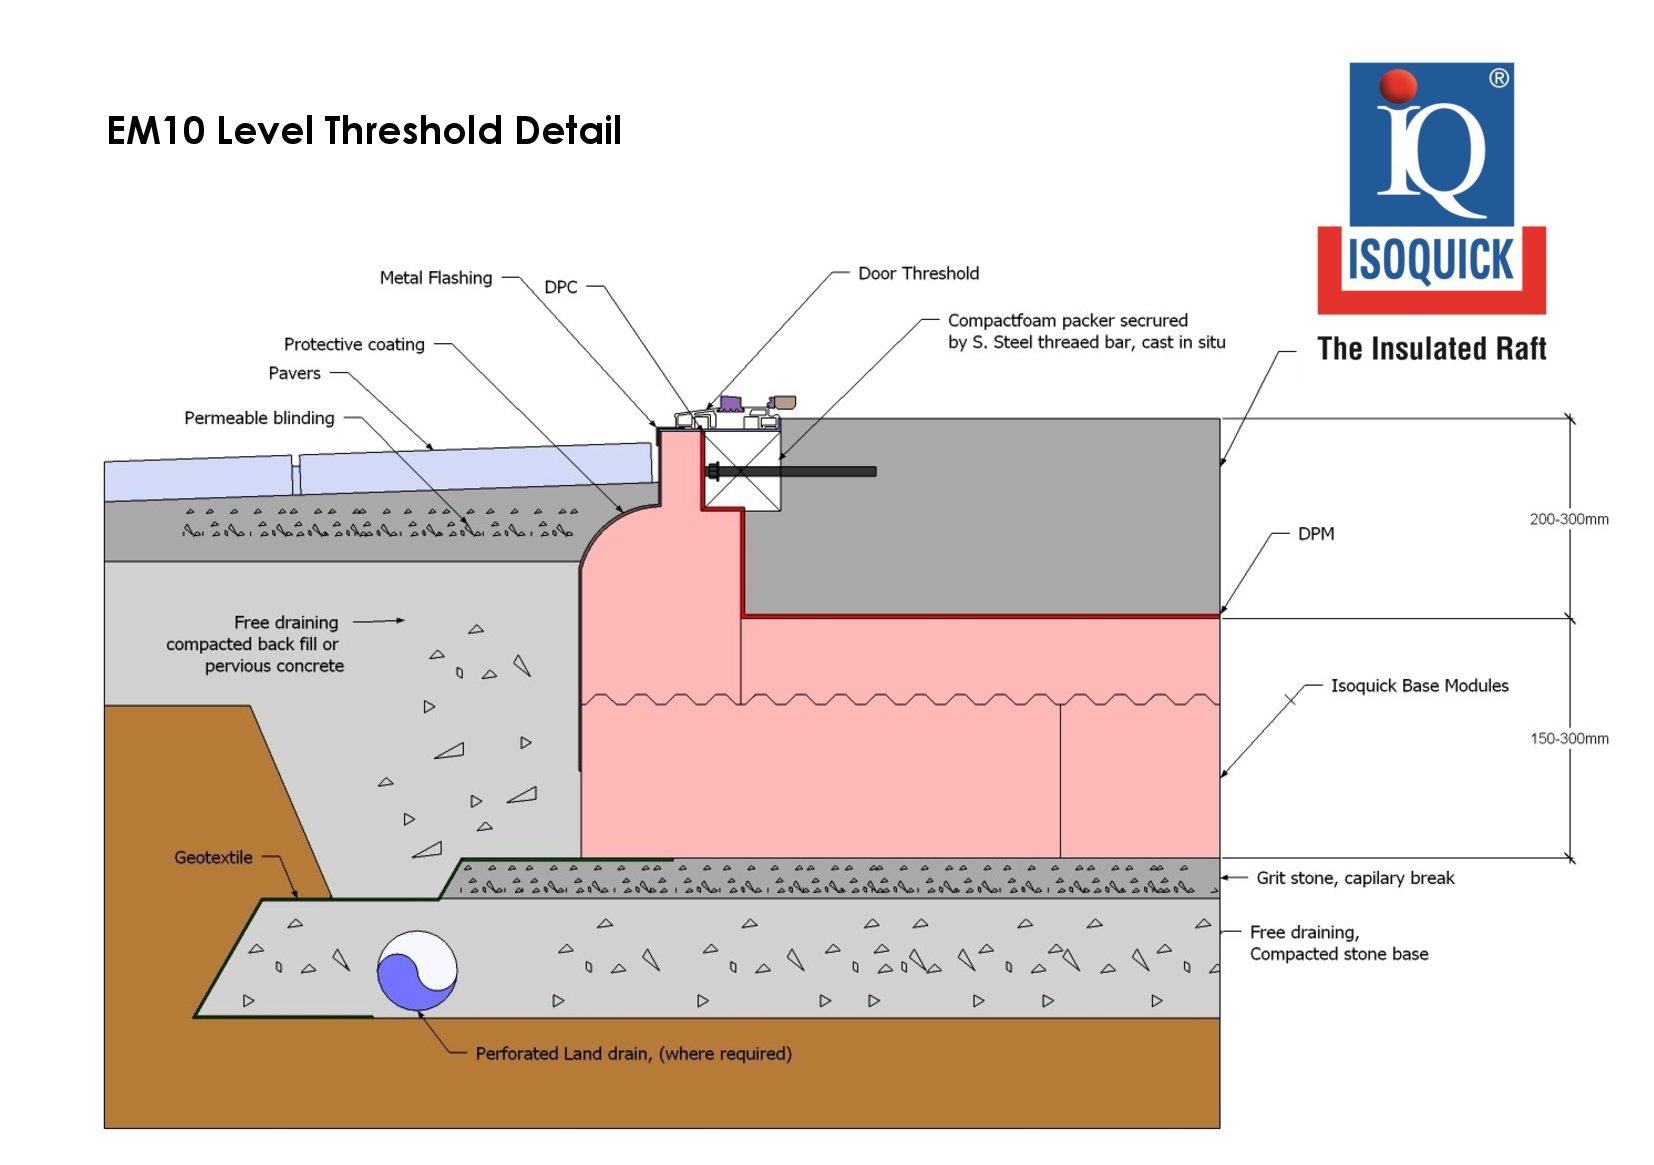 EM10 - Level Threshold Detail